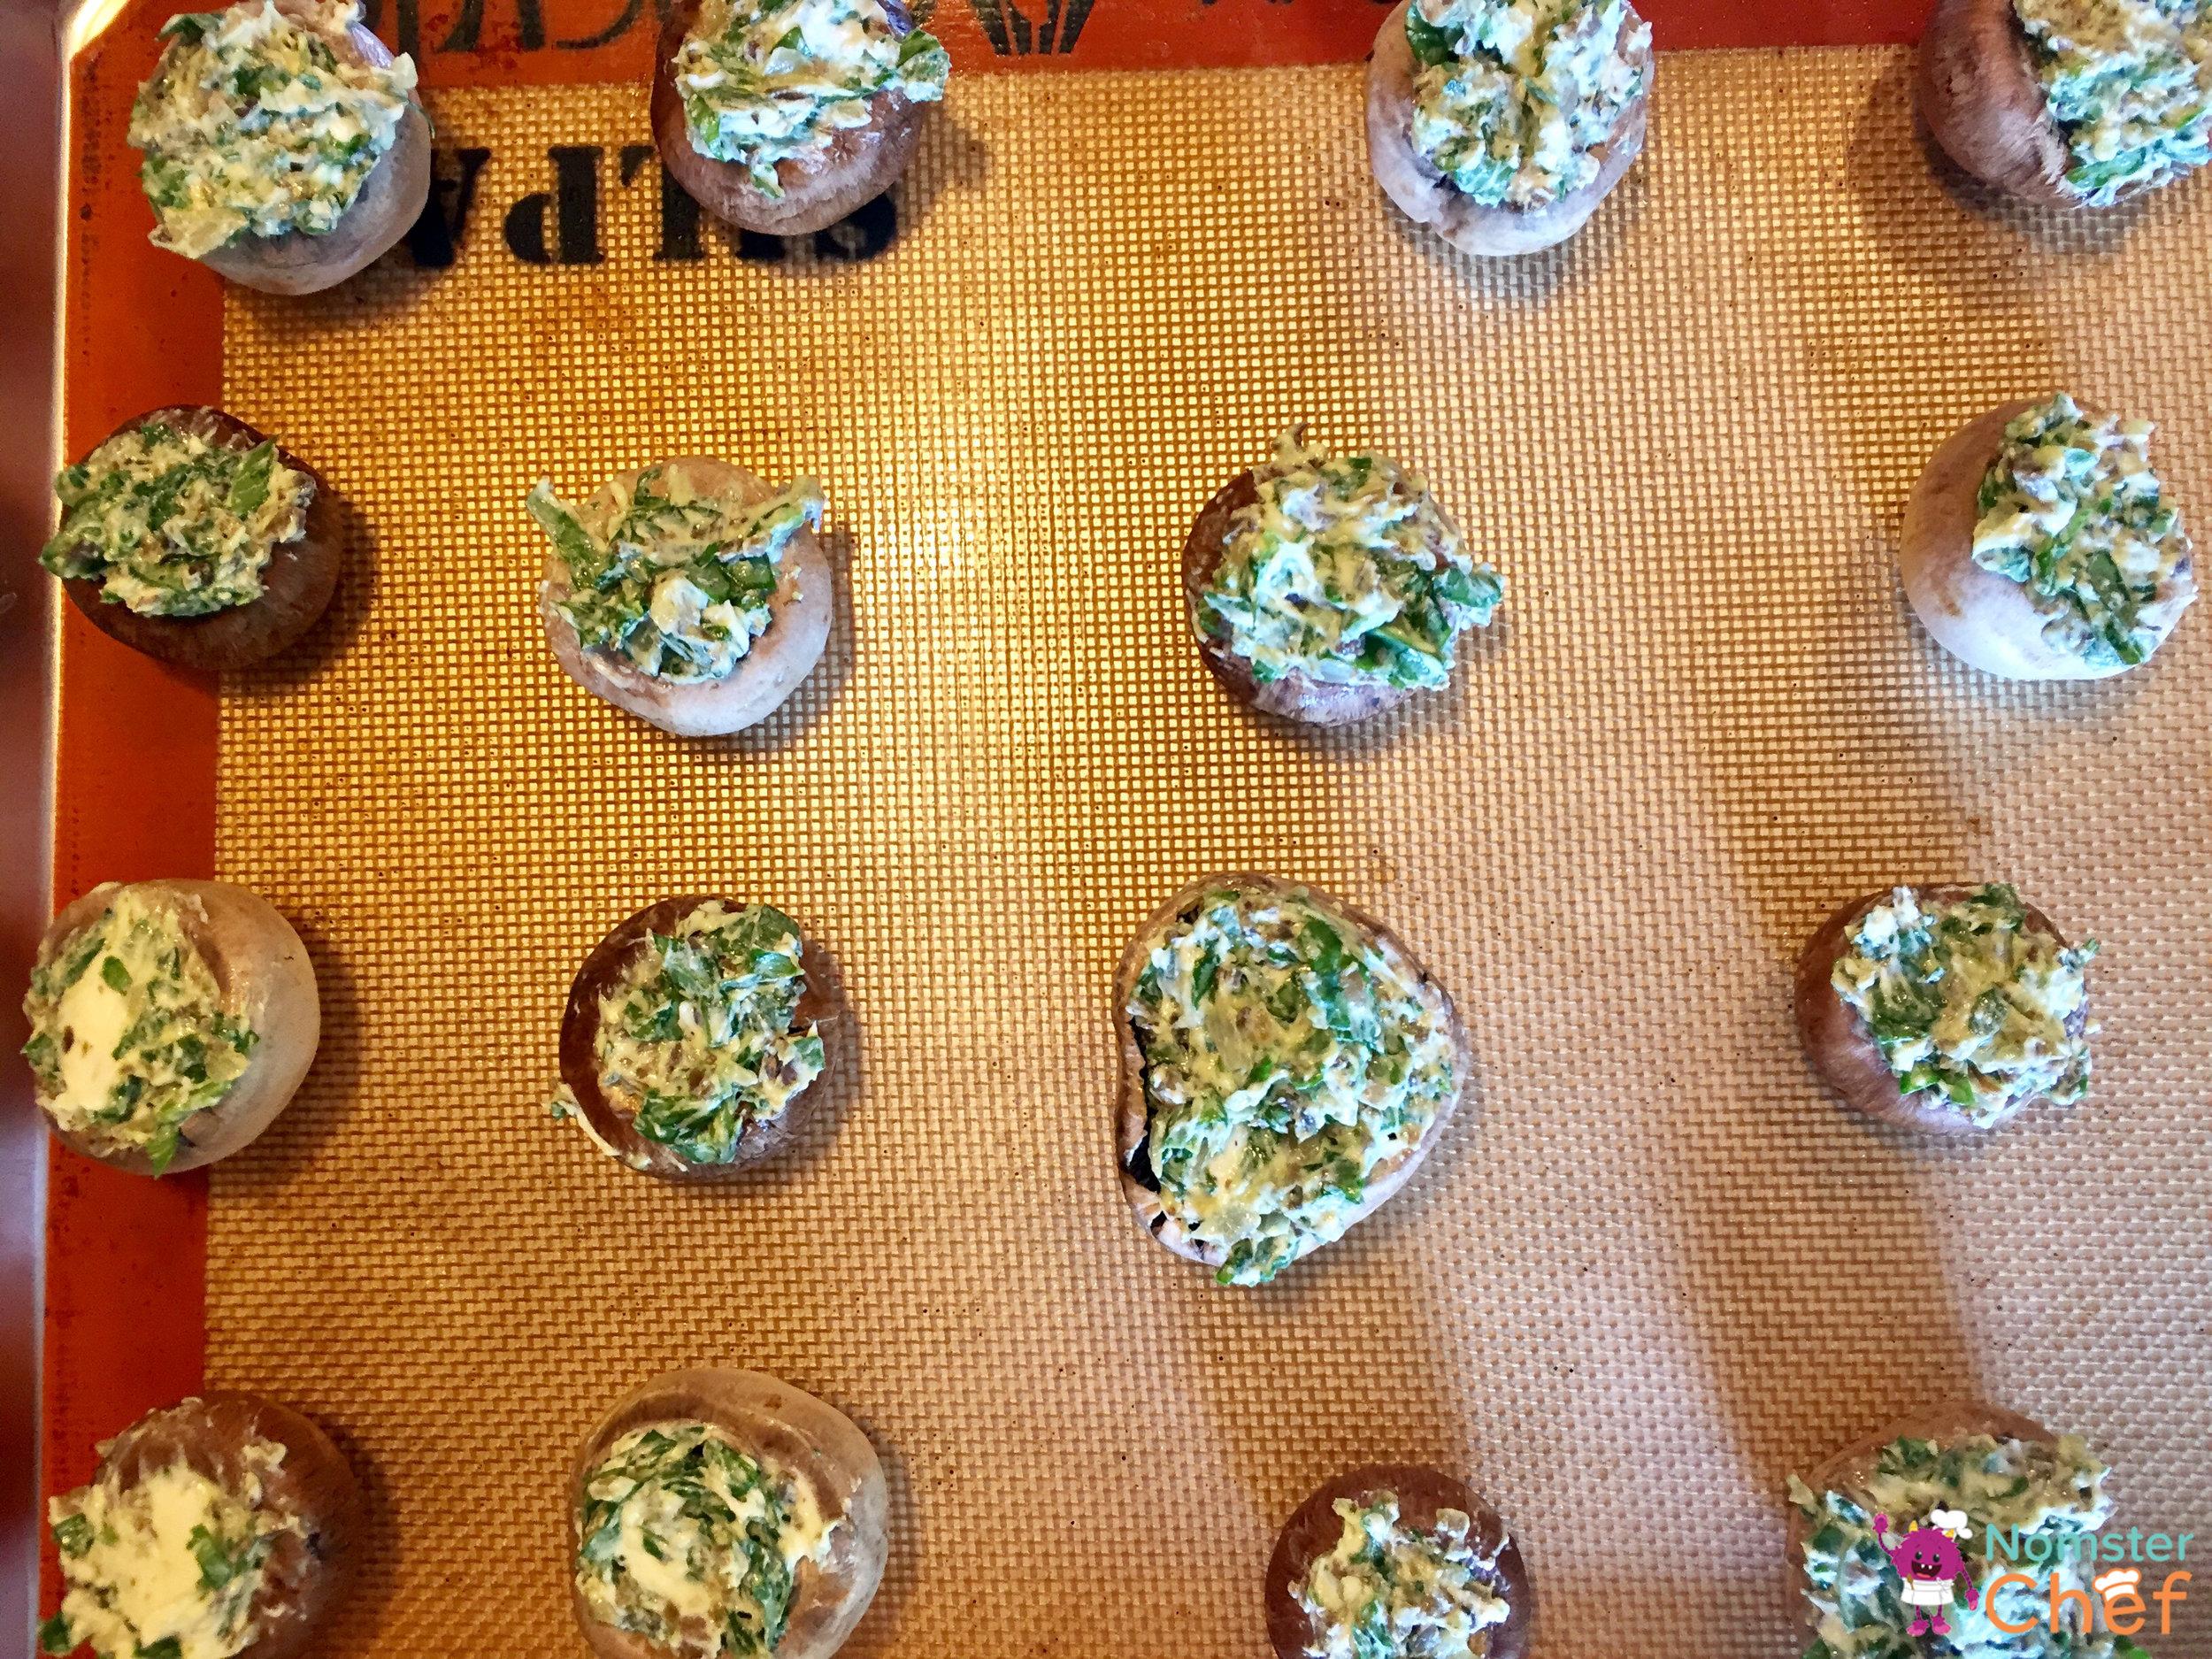 Shtuffed Shrooms - Nomster Chef Blog Recipe